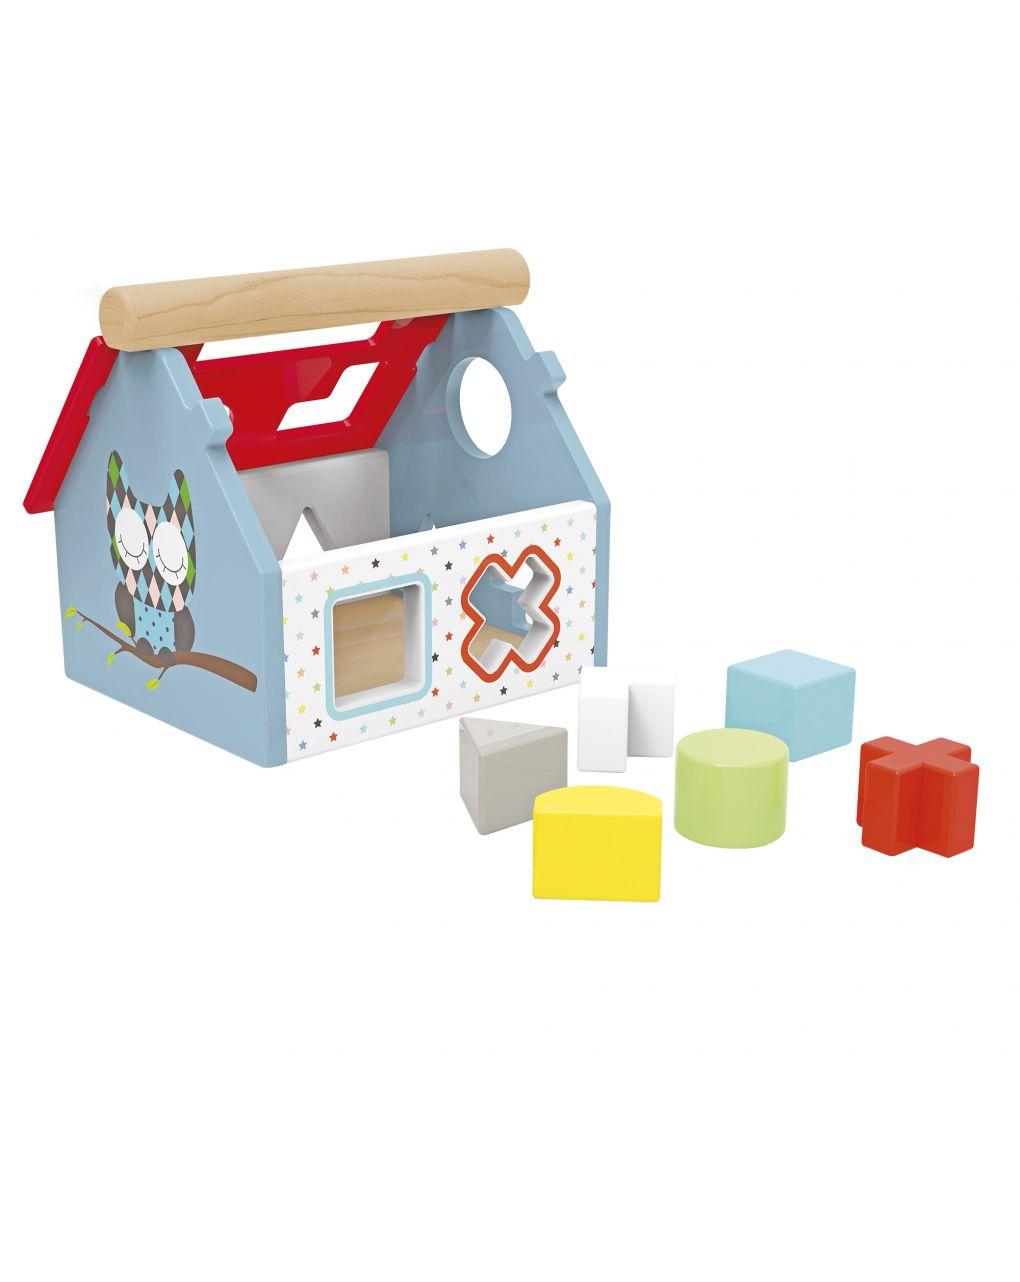 Wood'n play - casetta shape & colors - Wood'N'Play